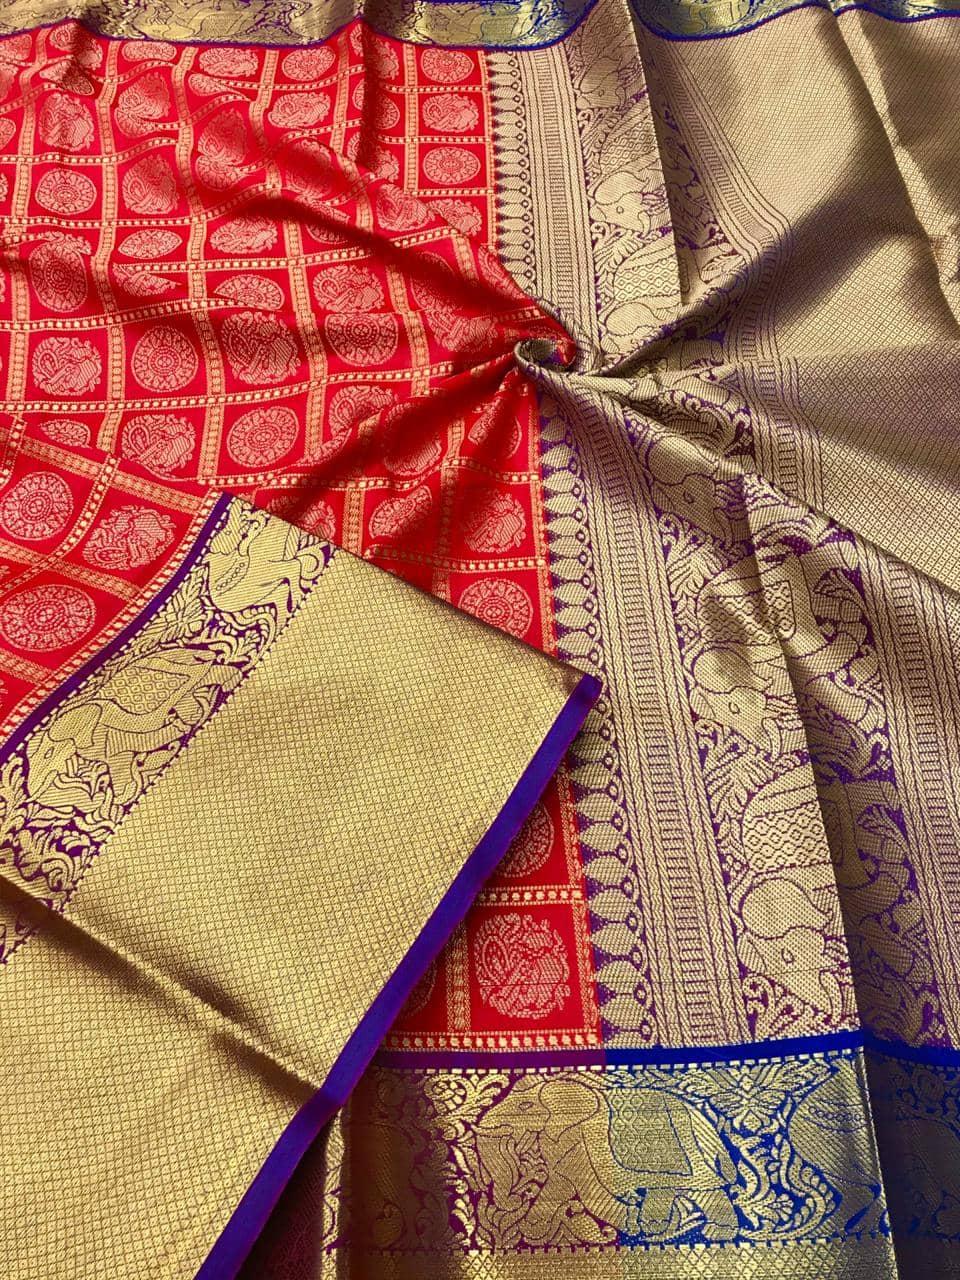 kanchipuram silk saree in Red dvz0001855